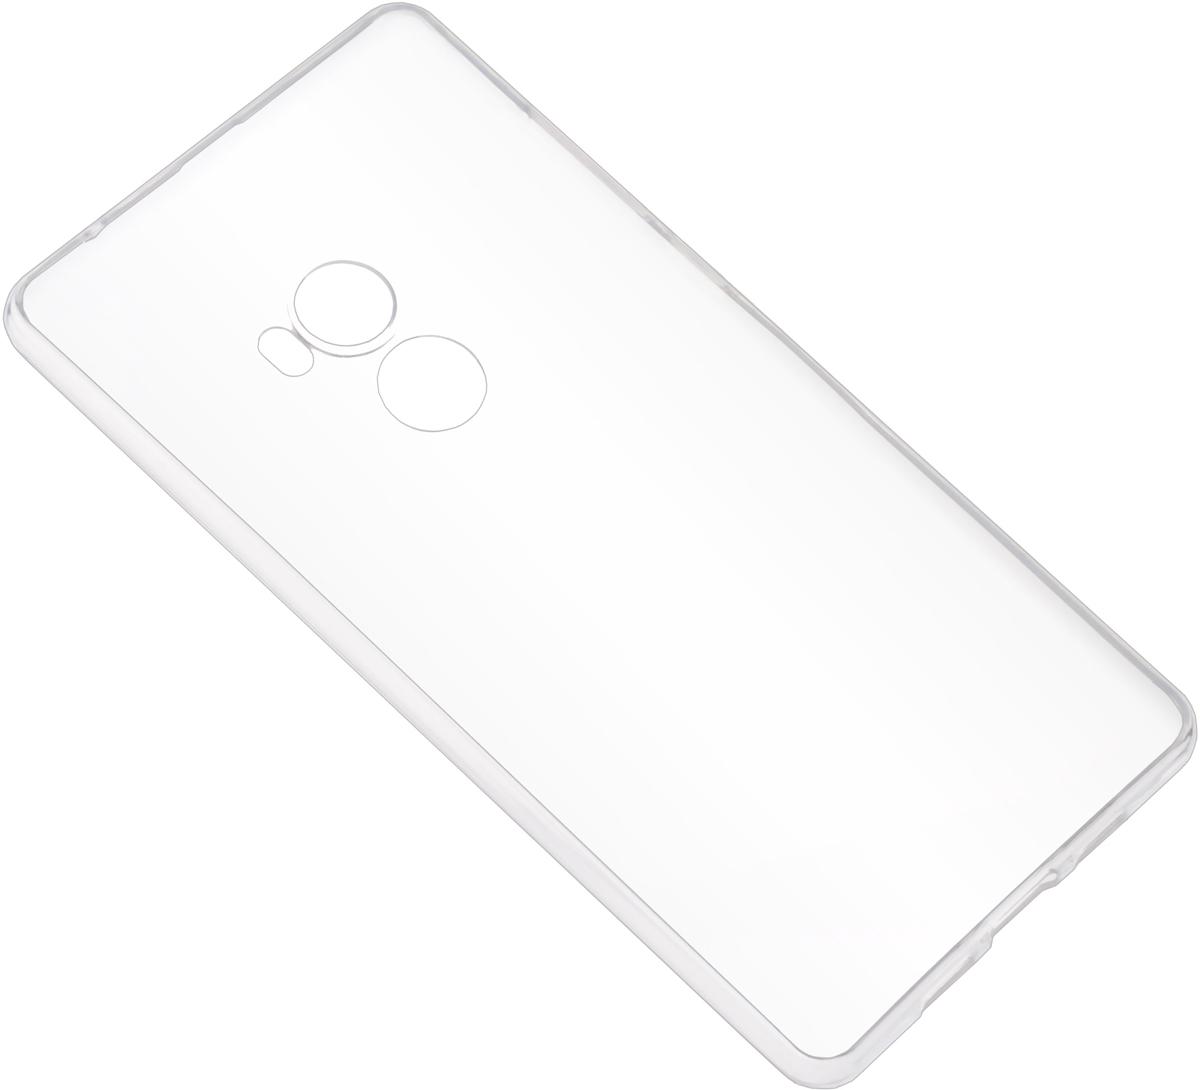 Skinbox Slim Silicone Case 4Peopleчехол для Xiaomi Mi Mix 2, Transparent Skinbox